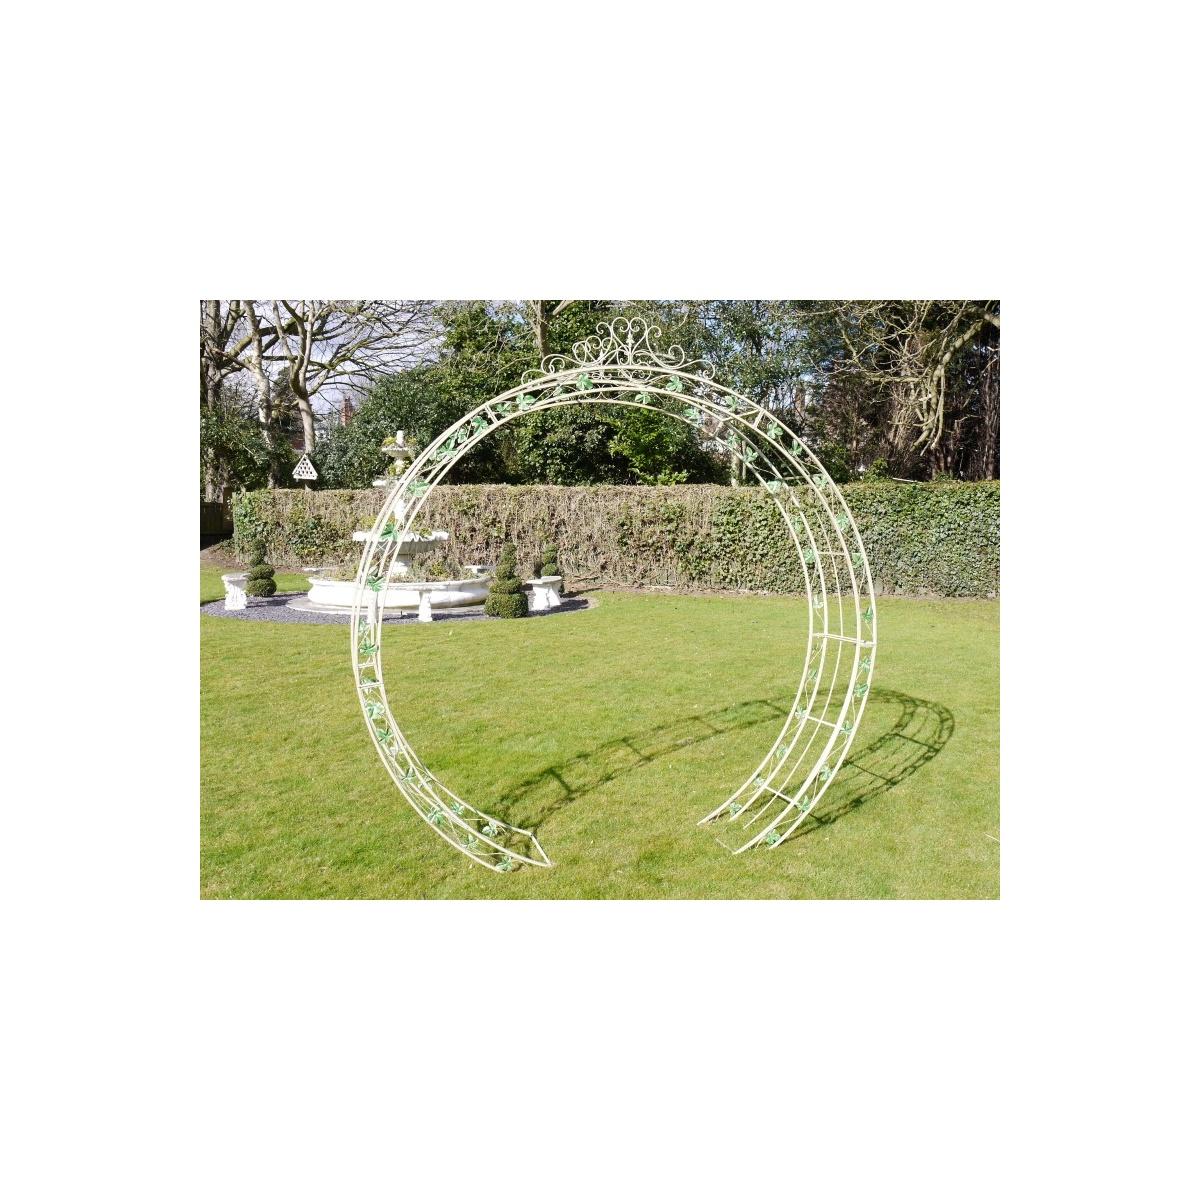 Metal Garden Arch Round Swanky Interiors : 1447324895 93374700 from swankyinteriors.co.uk size 1200 x 1200 jpeg 360kB